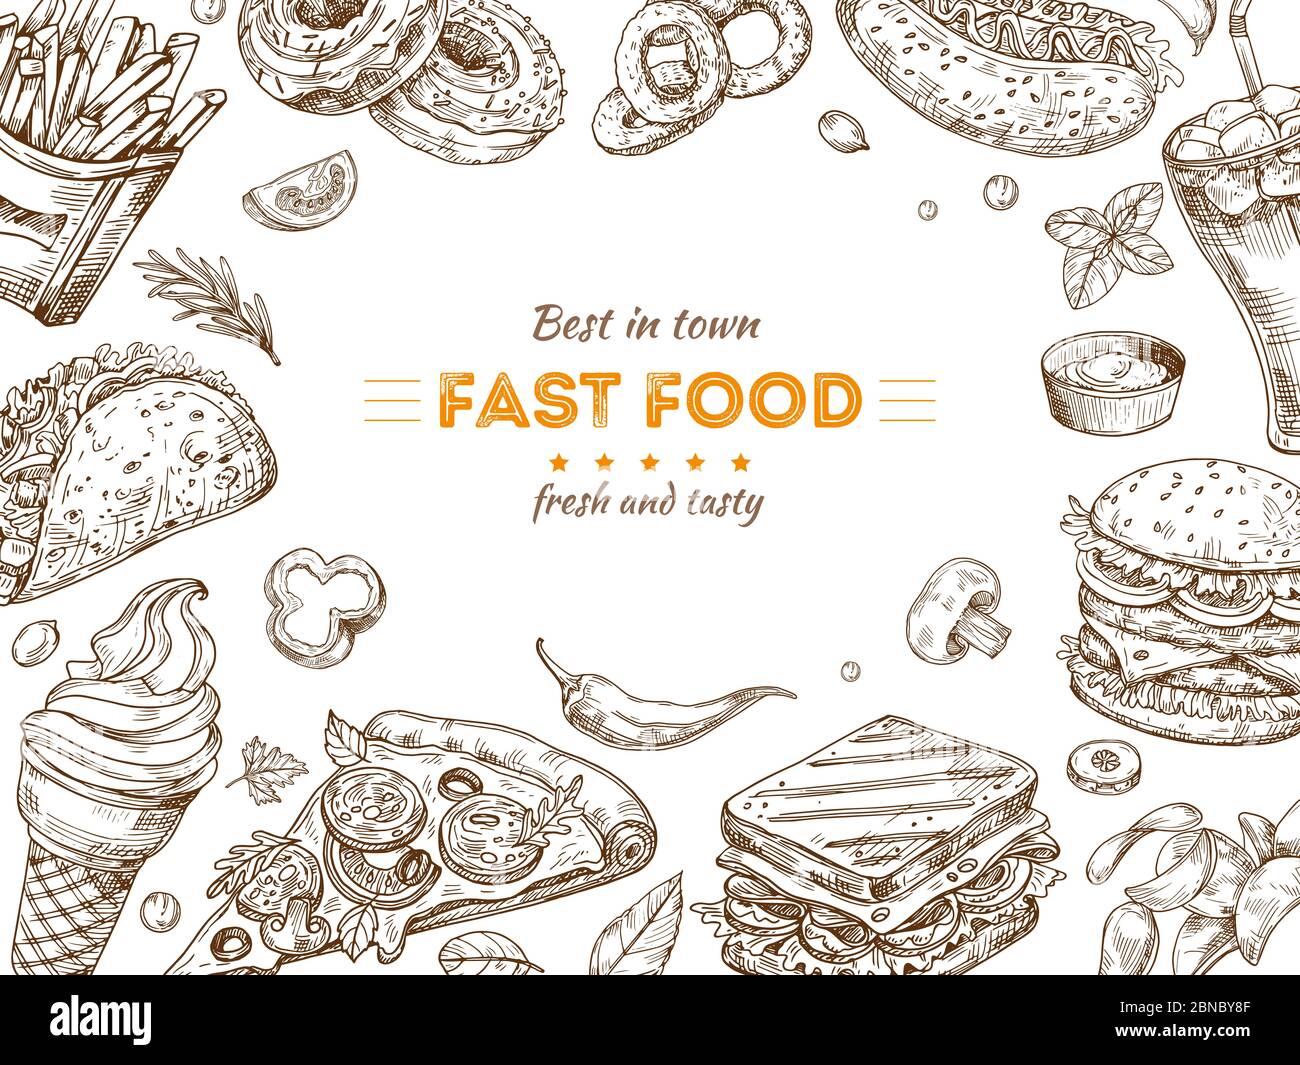 https www alamy com fast food background sketch drawing hamburger cola snacks doodle ice cream pizza and sandwich fast food restaurant vector poster illustration of fast food doodle dinner menu banner image357378015 html